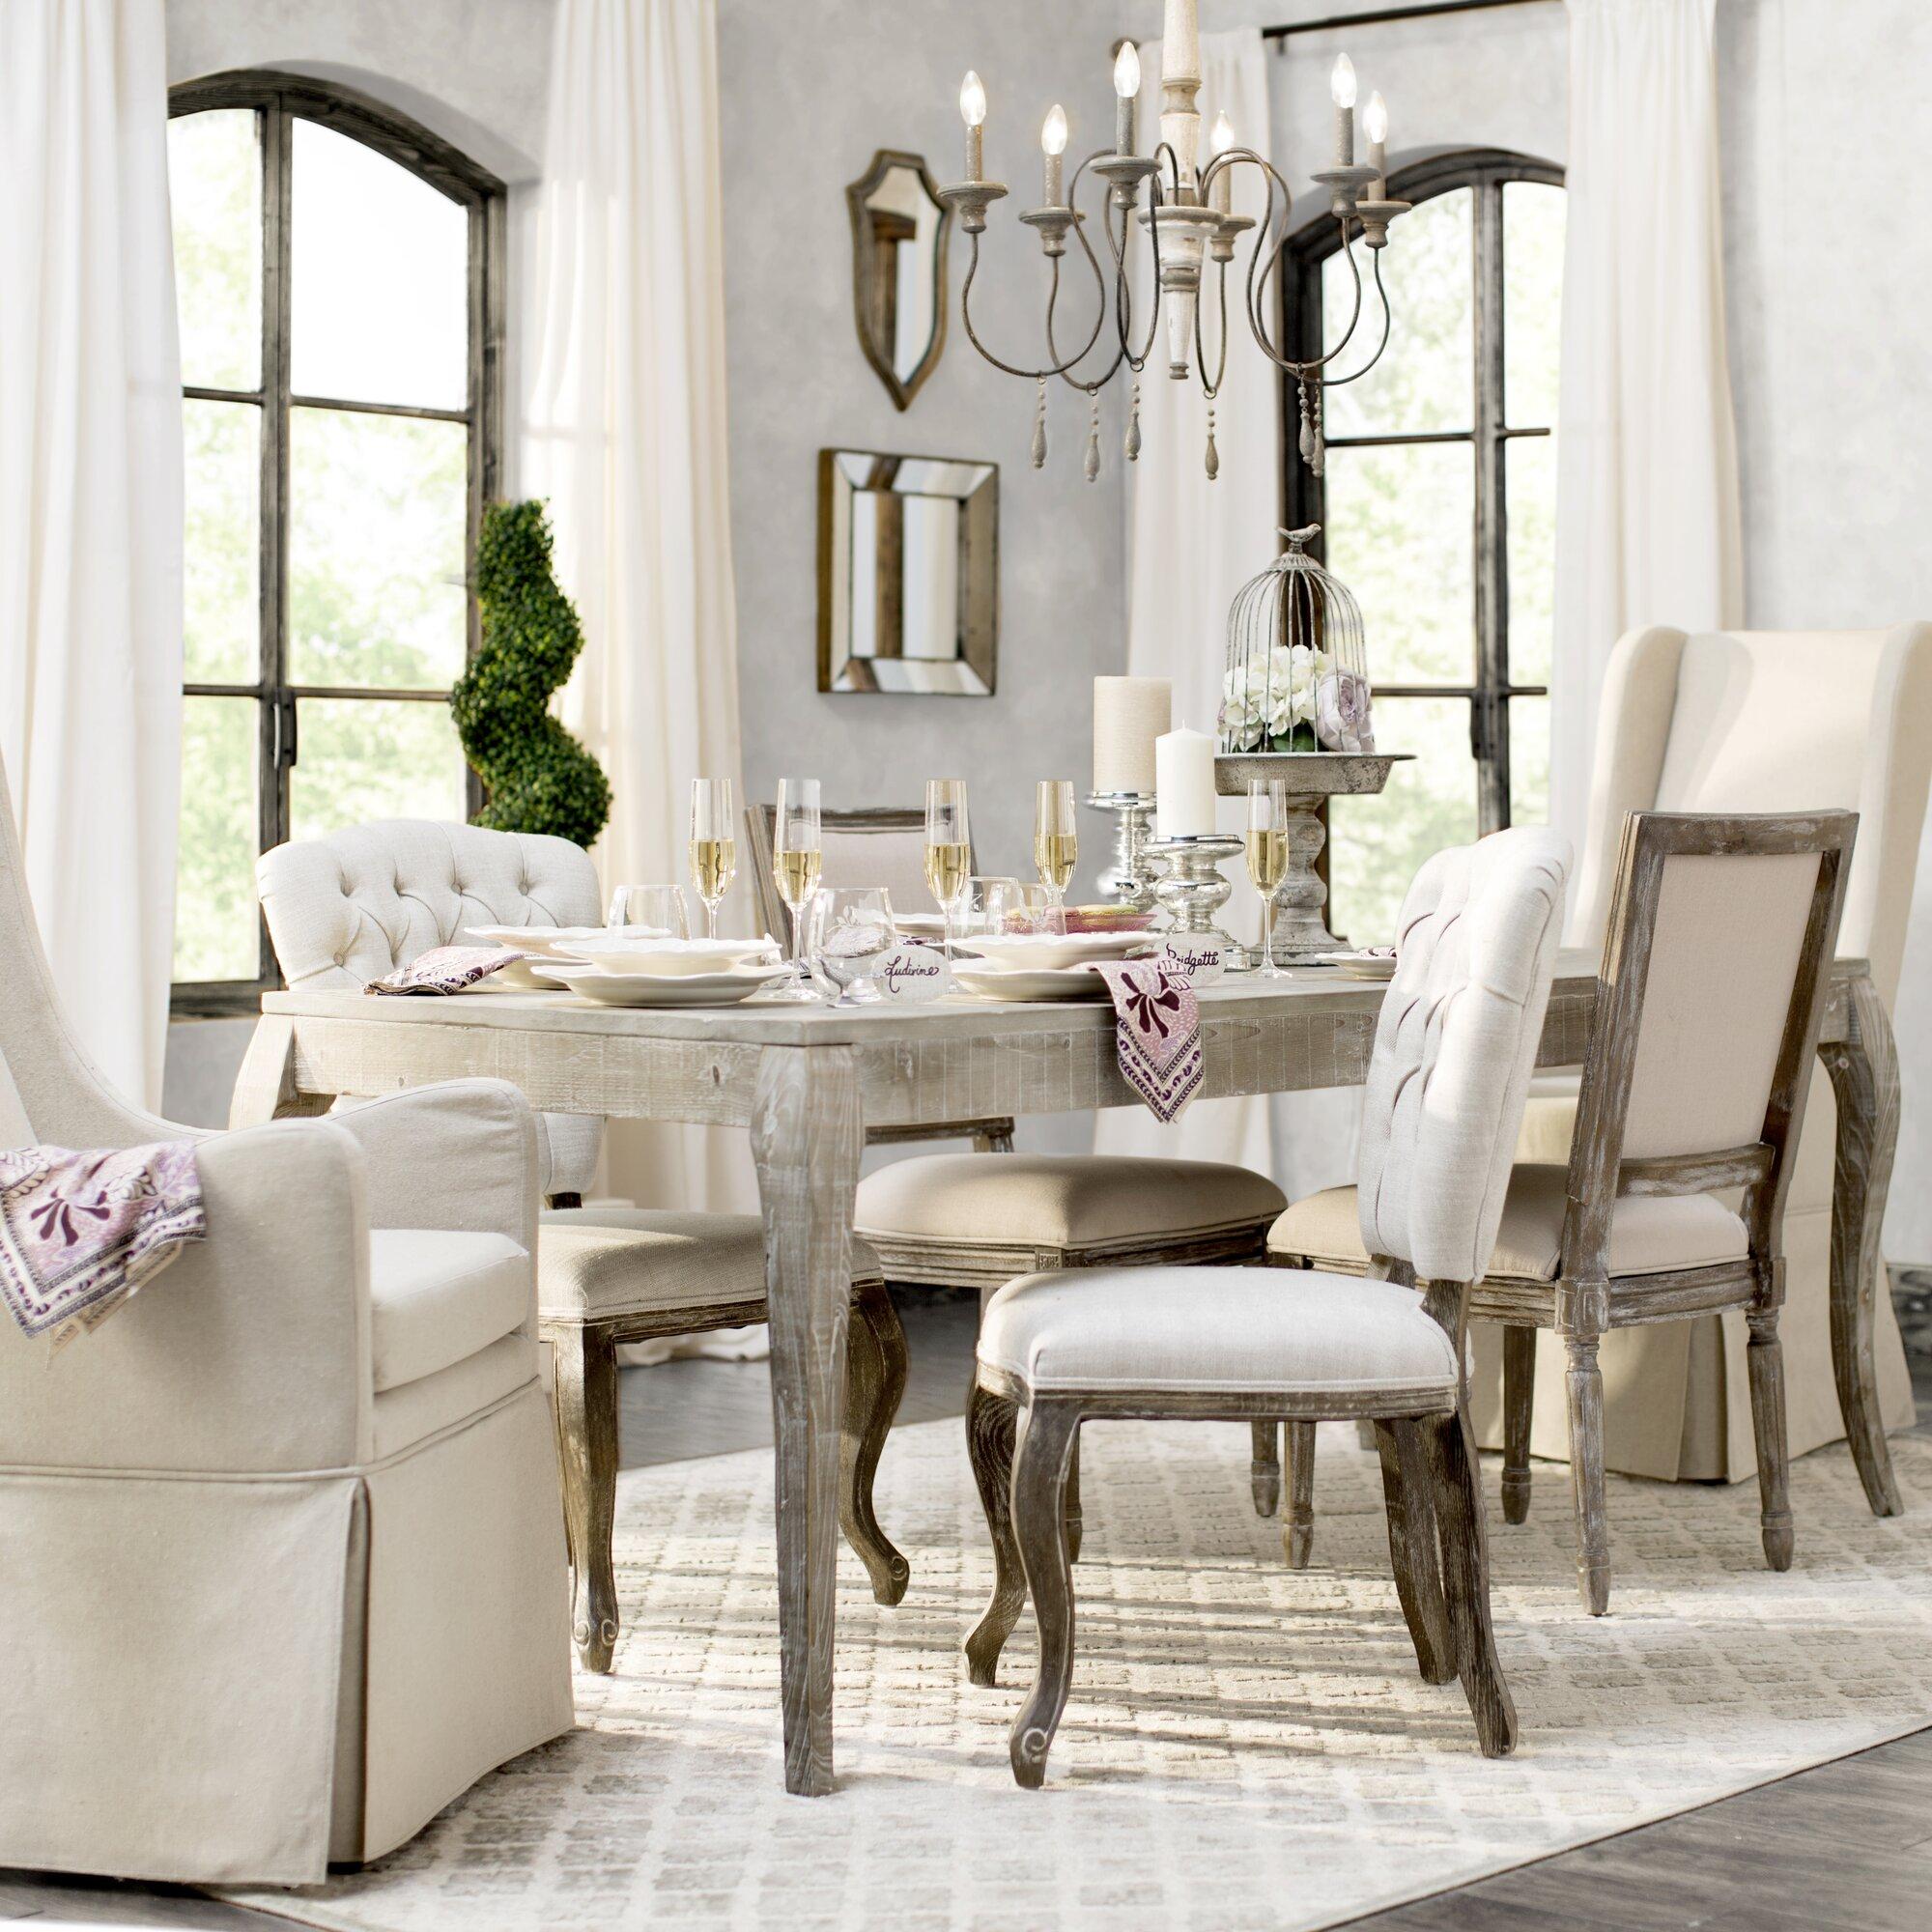 Valerie Reclaimed Pine Wood Dining Table & Reviews | Joss & Main